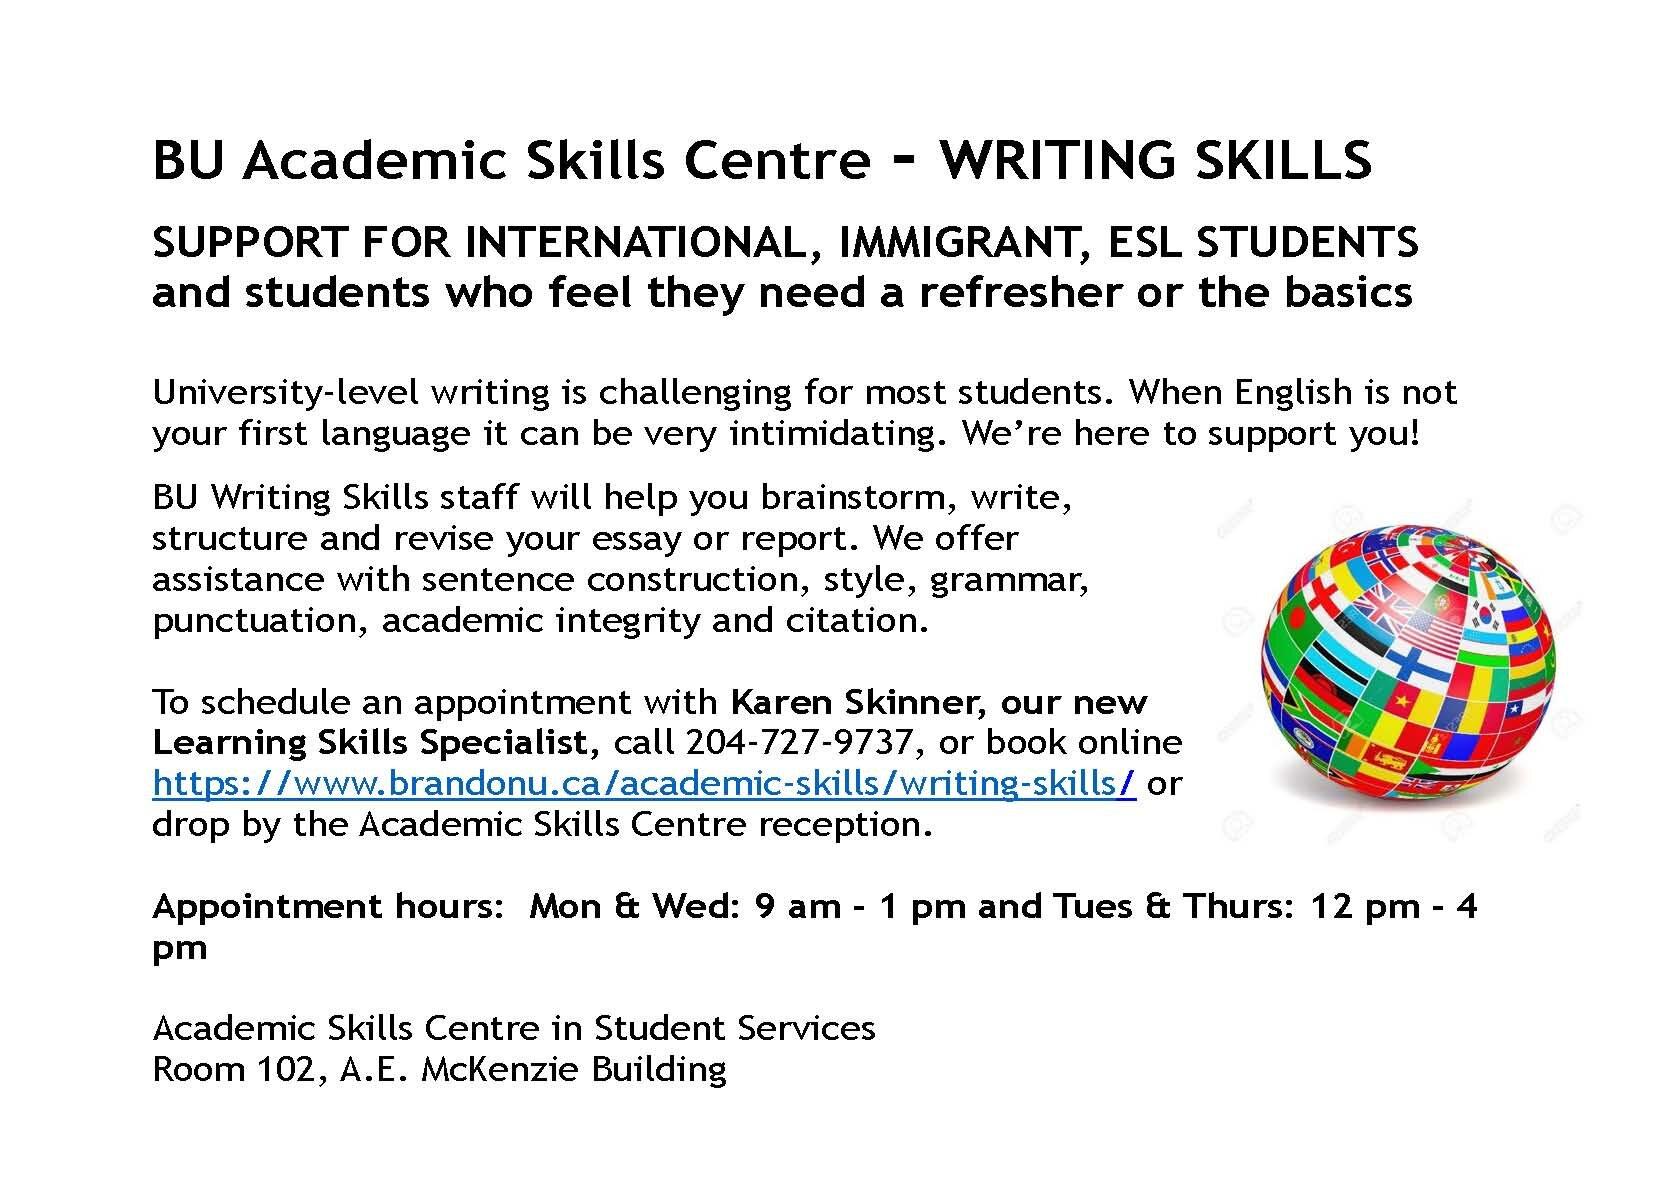 Writing Skills Advertisement Poster.jpg